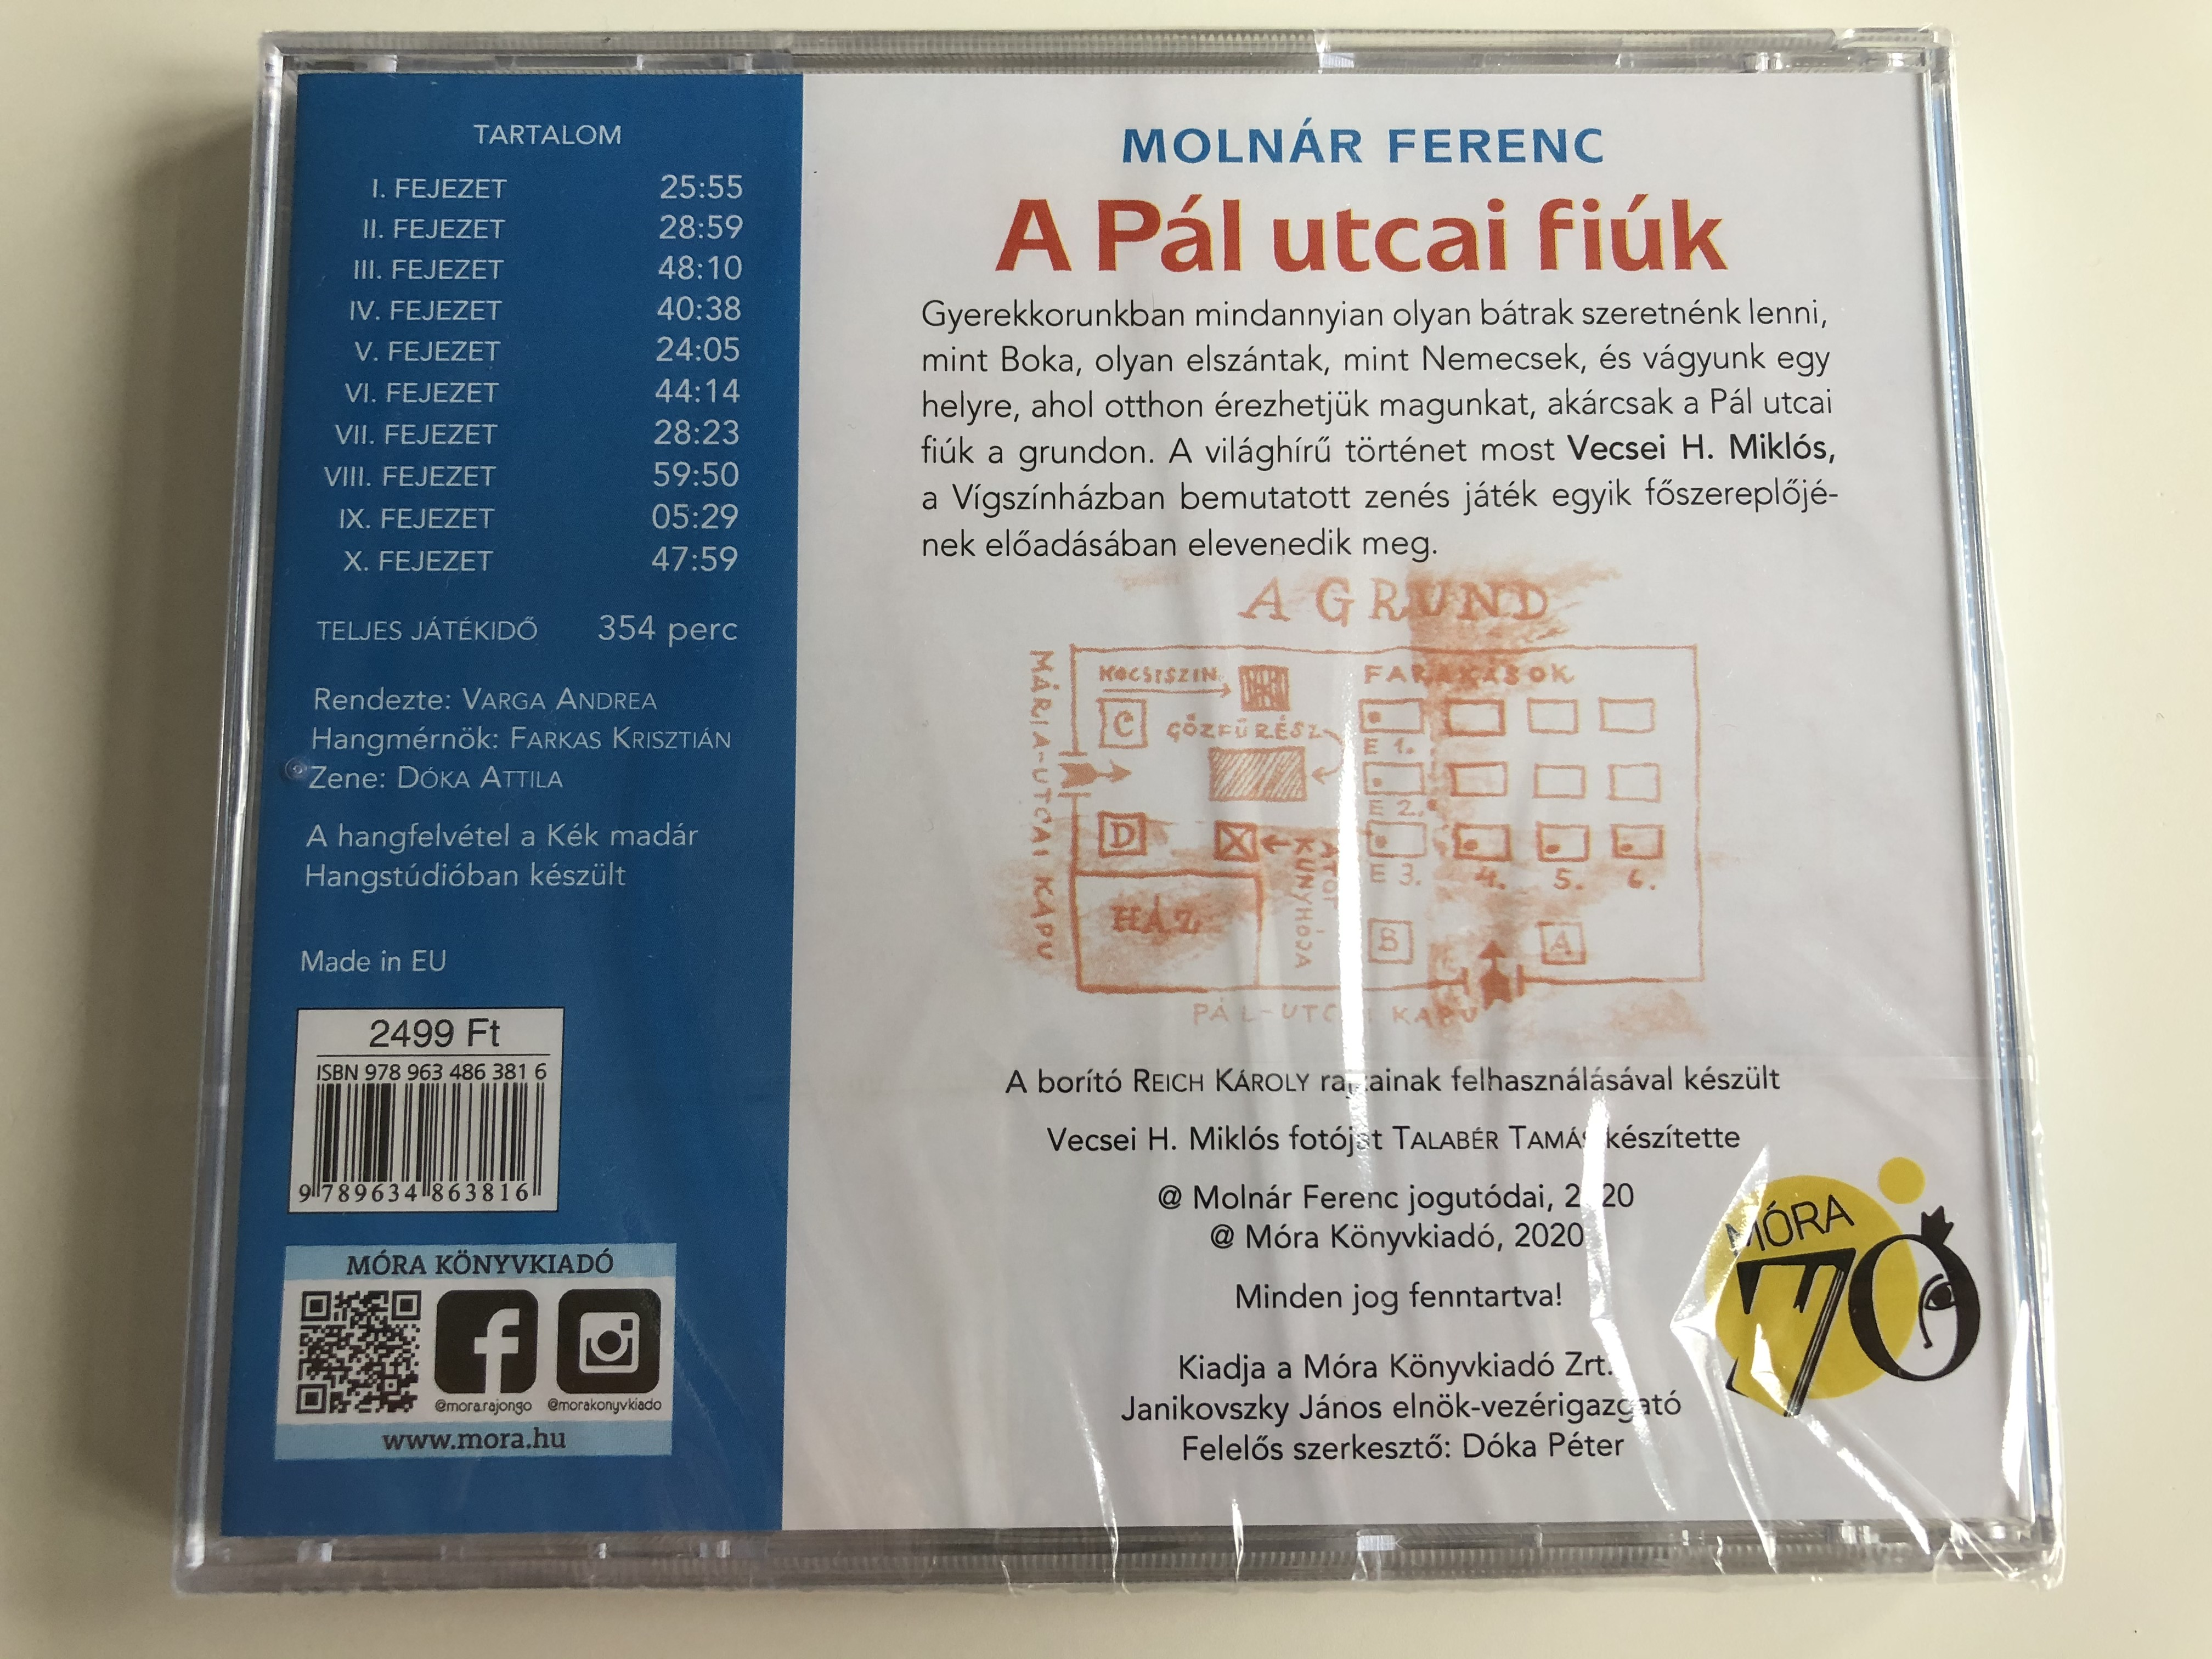 molar-ferenc-a-pal-utcai-fiuk-vecsei-h.-miklos-eloadasaban-mora-konyvkiado-audio-cd-2020-9789634863816-3-.jpg